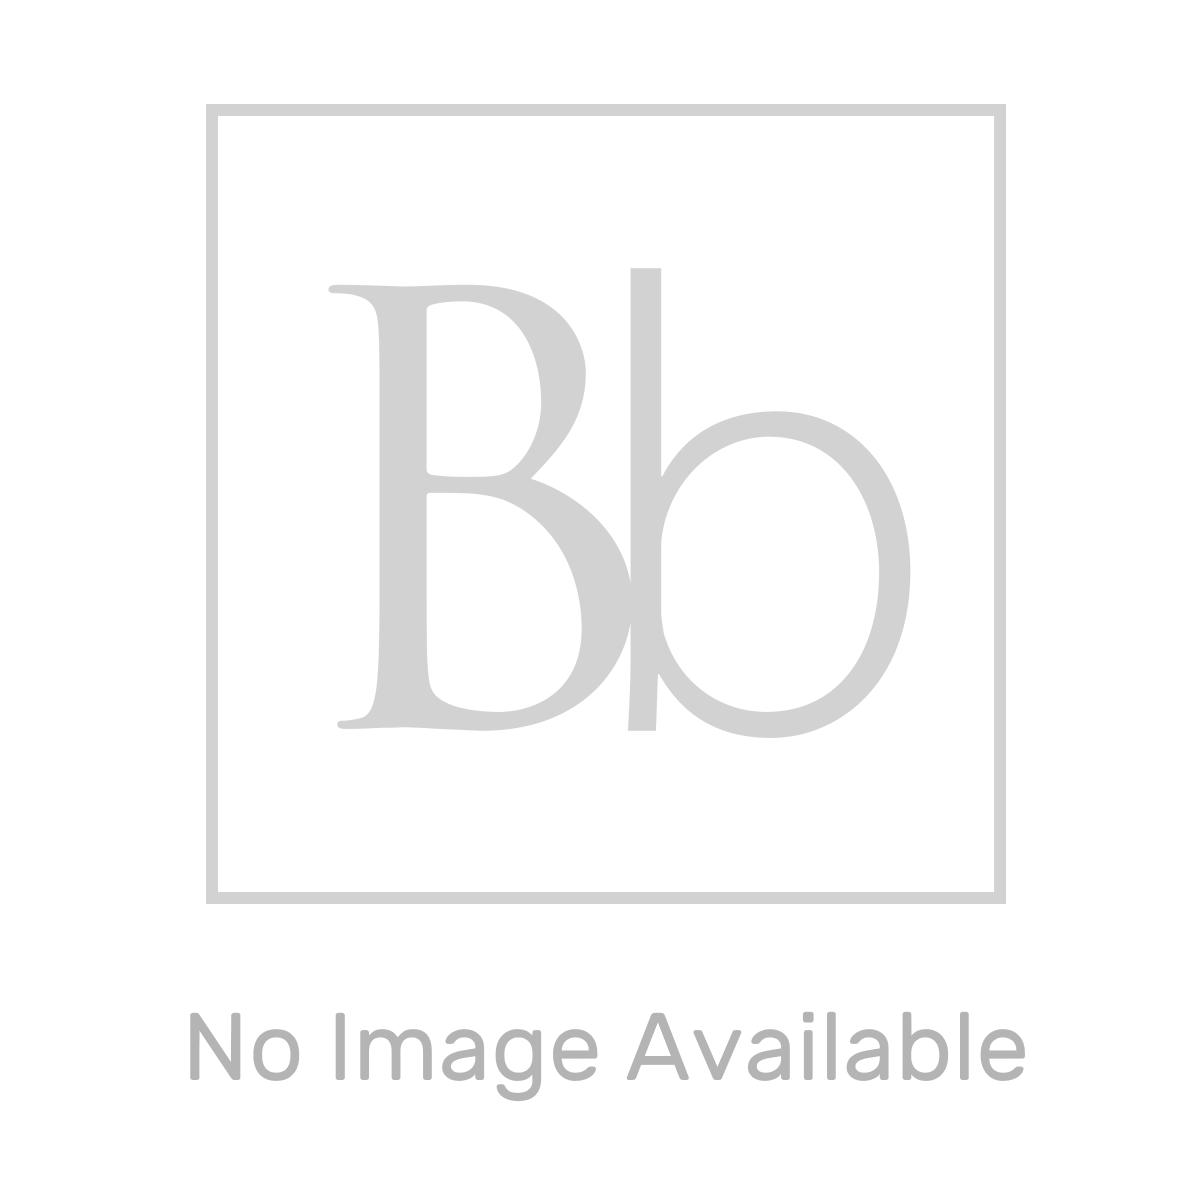 RAK Compact Close Coupled Toilet